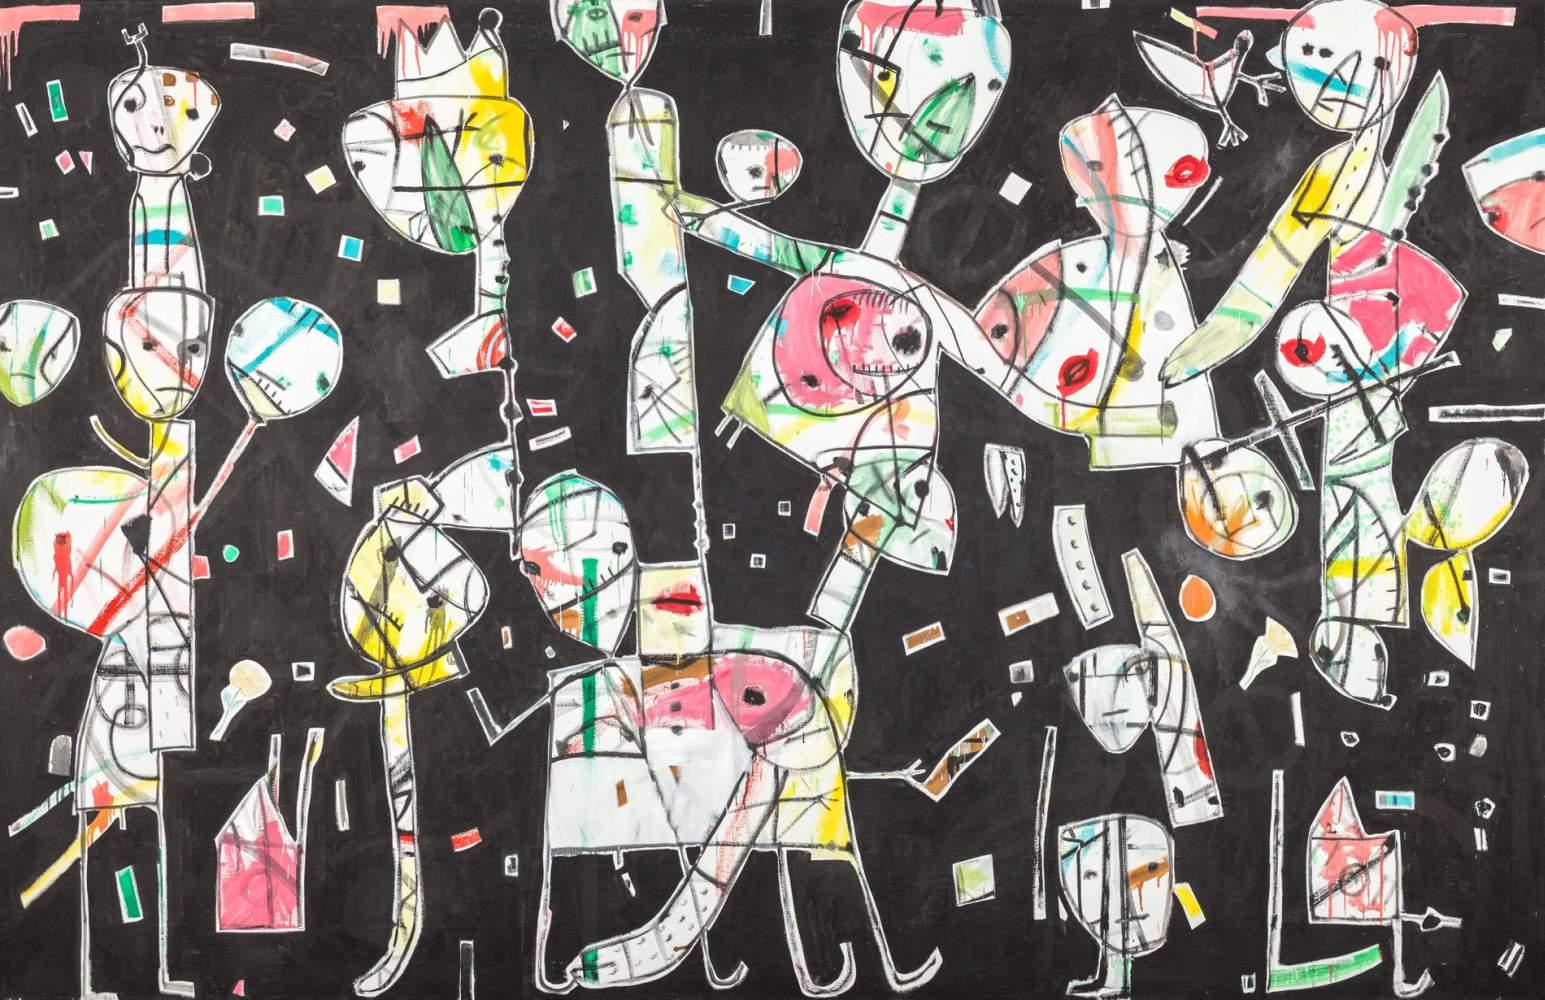 Anselm Glück * (Linz 1950 geb.)  Befruchtungsriten 7 Öl auf Leinwand 200 x 300 cm 1993 rückseitig